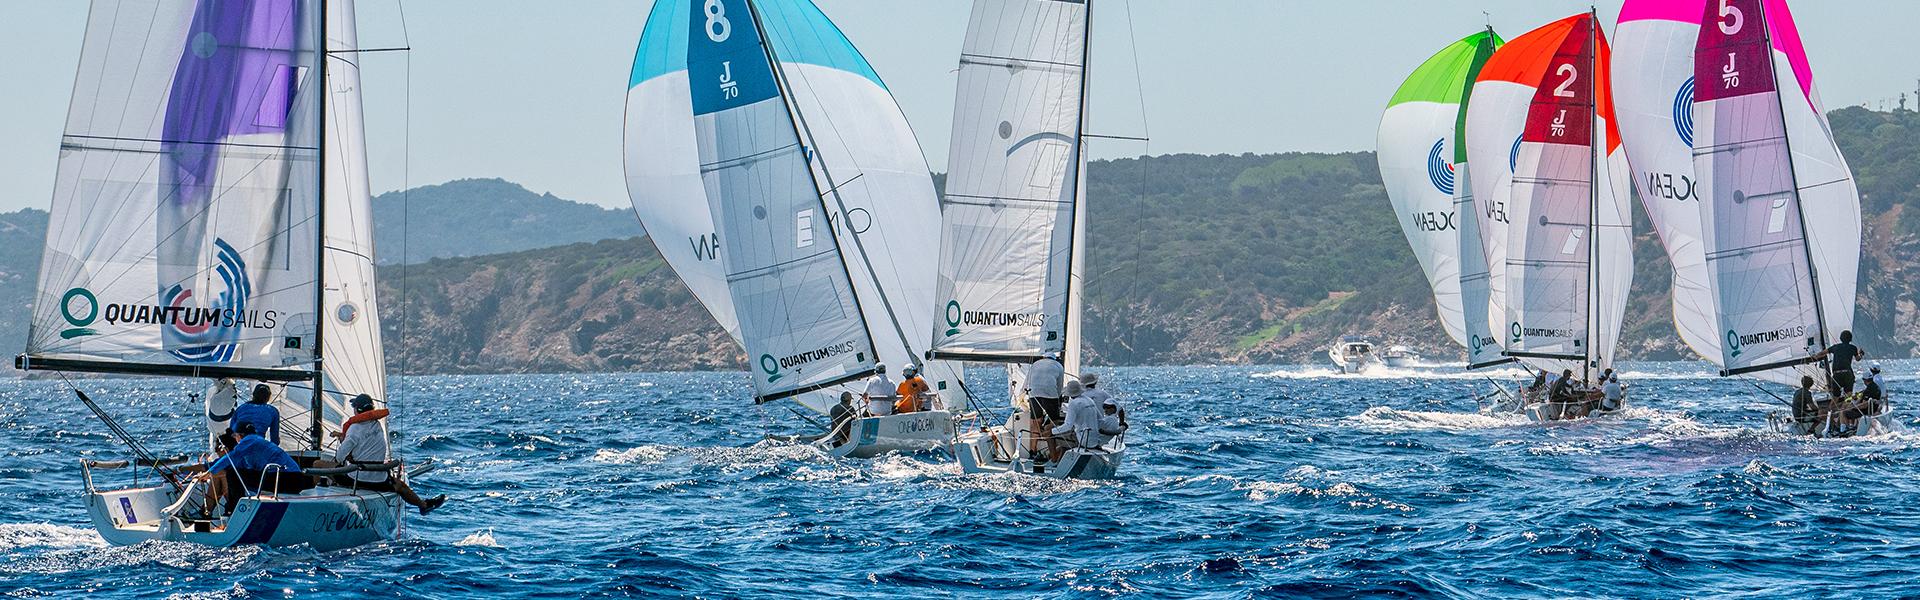 YCCS Members Championship - Porto Cervo 2021